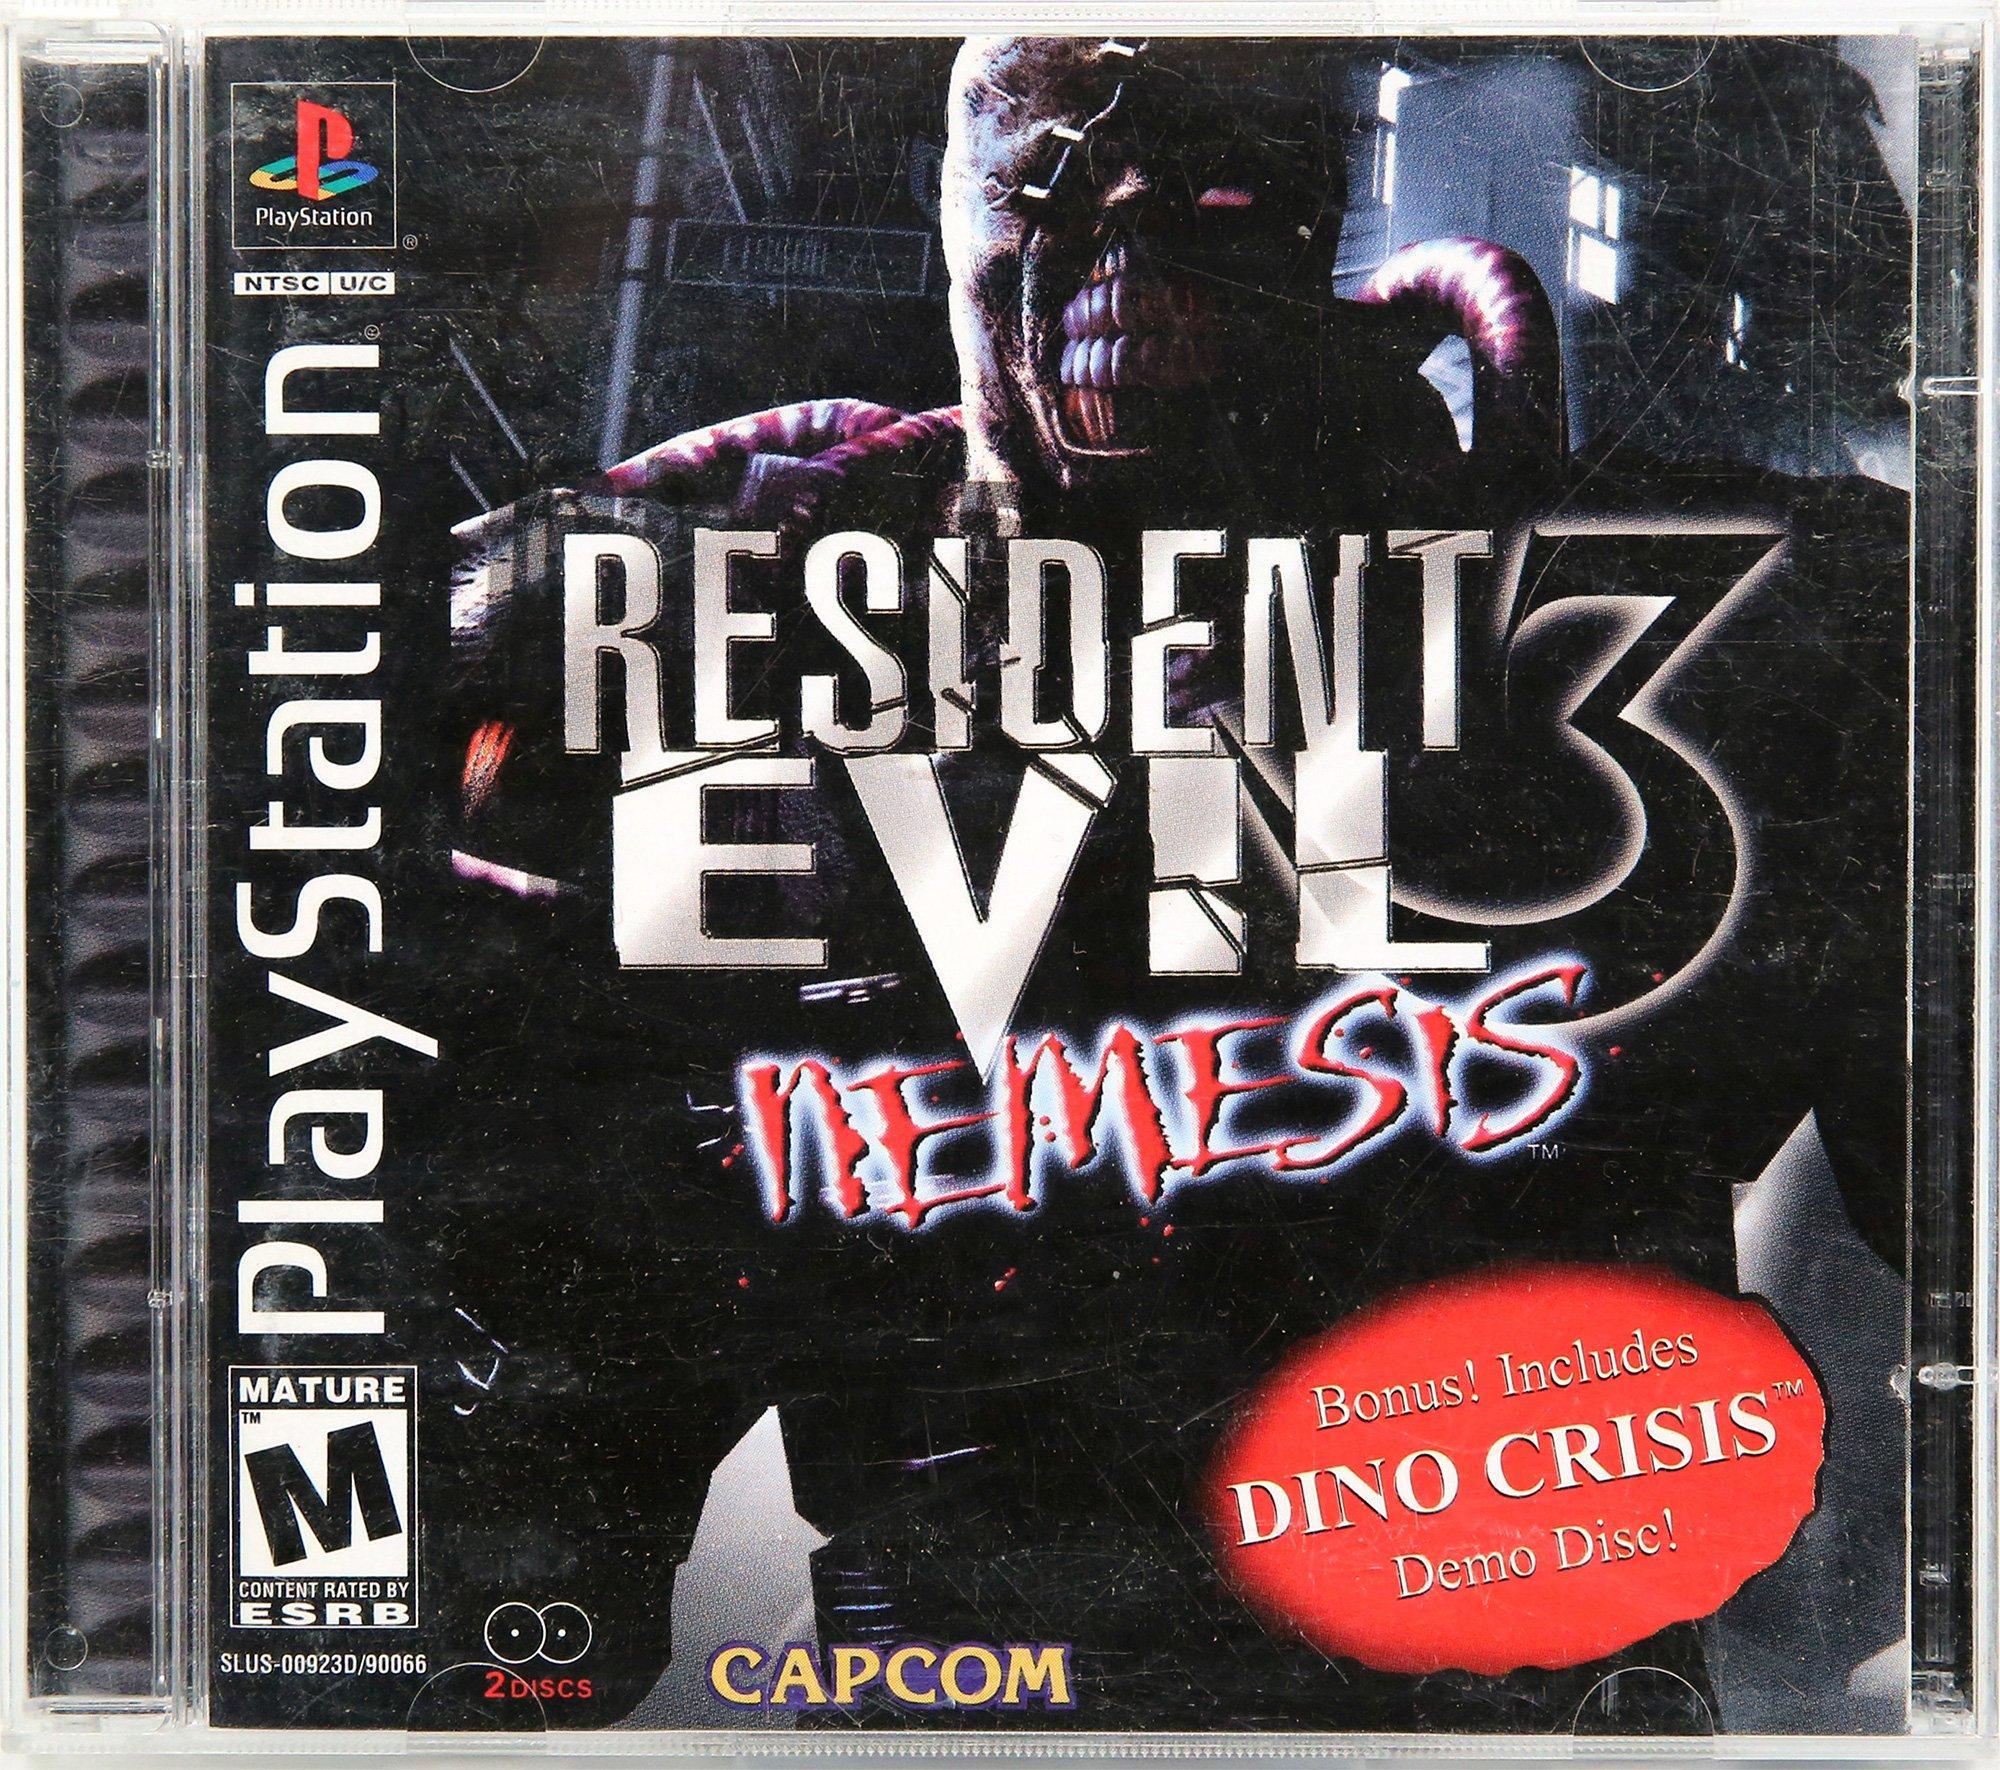 Resident Evil 3 Nemesis Playstation Gamestop